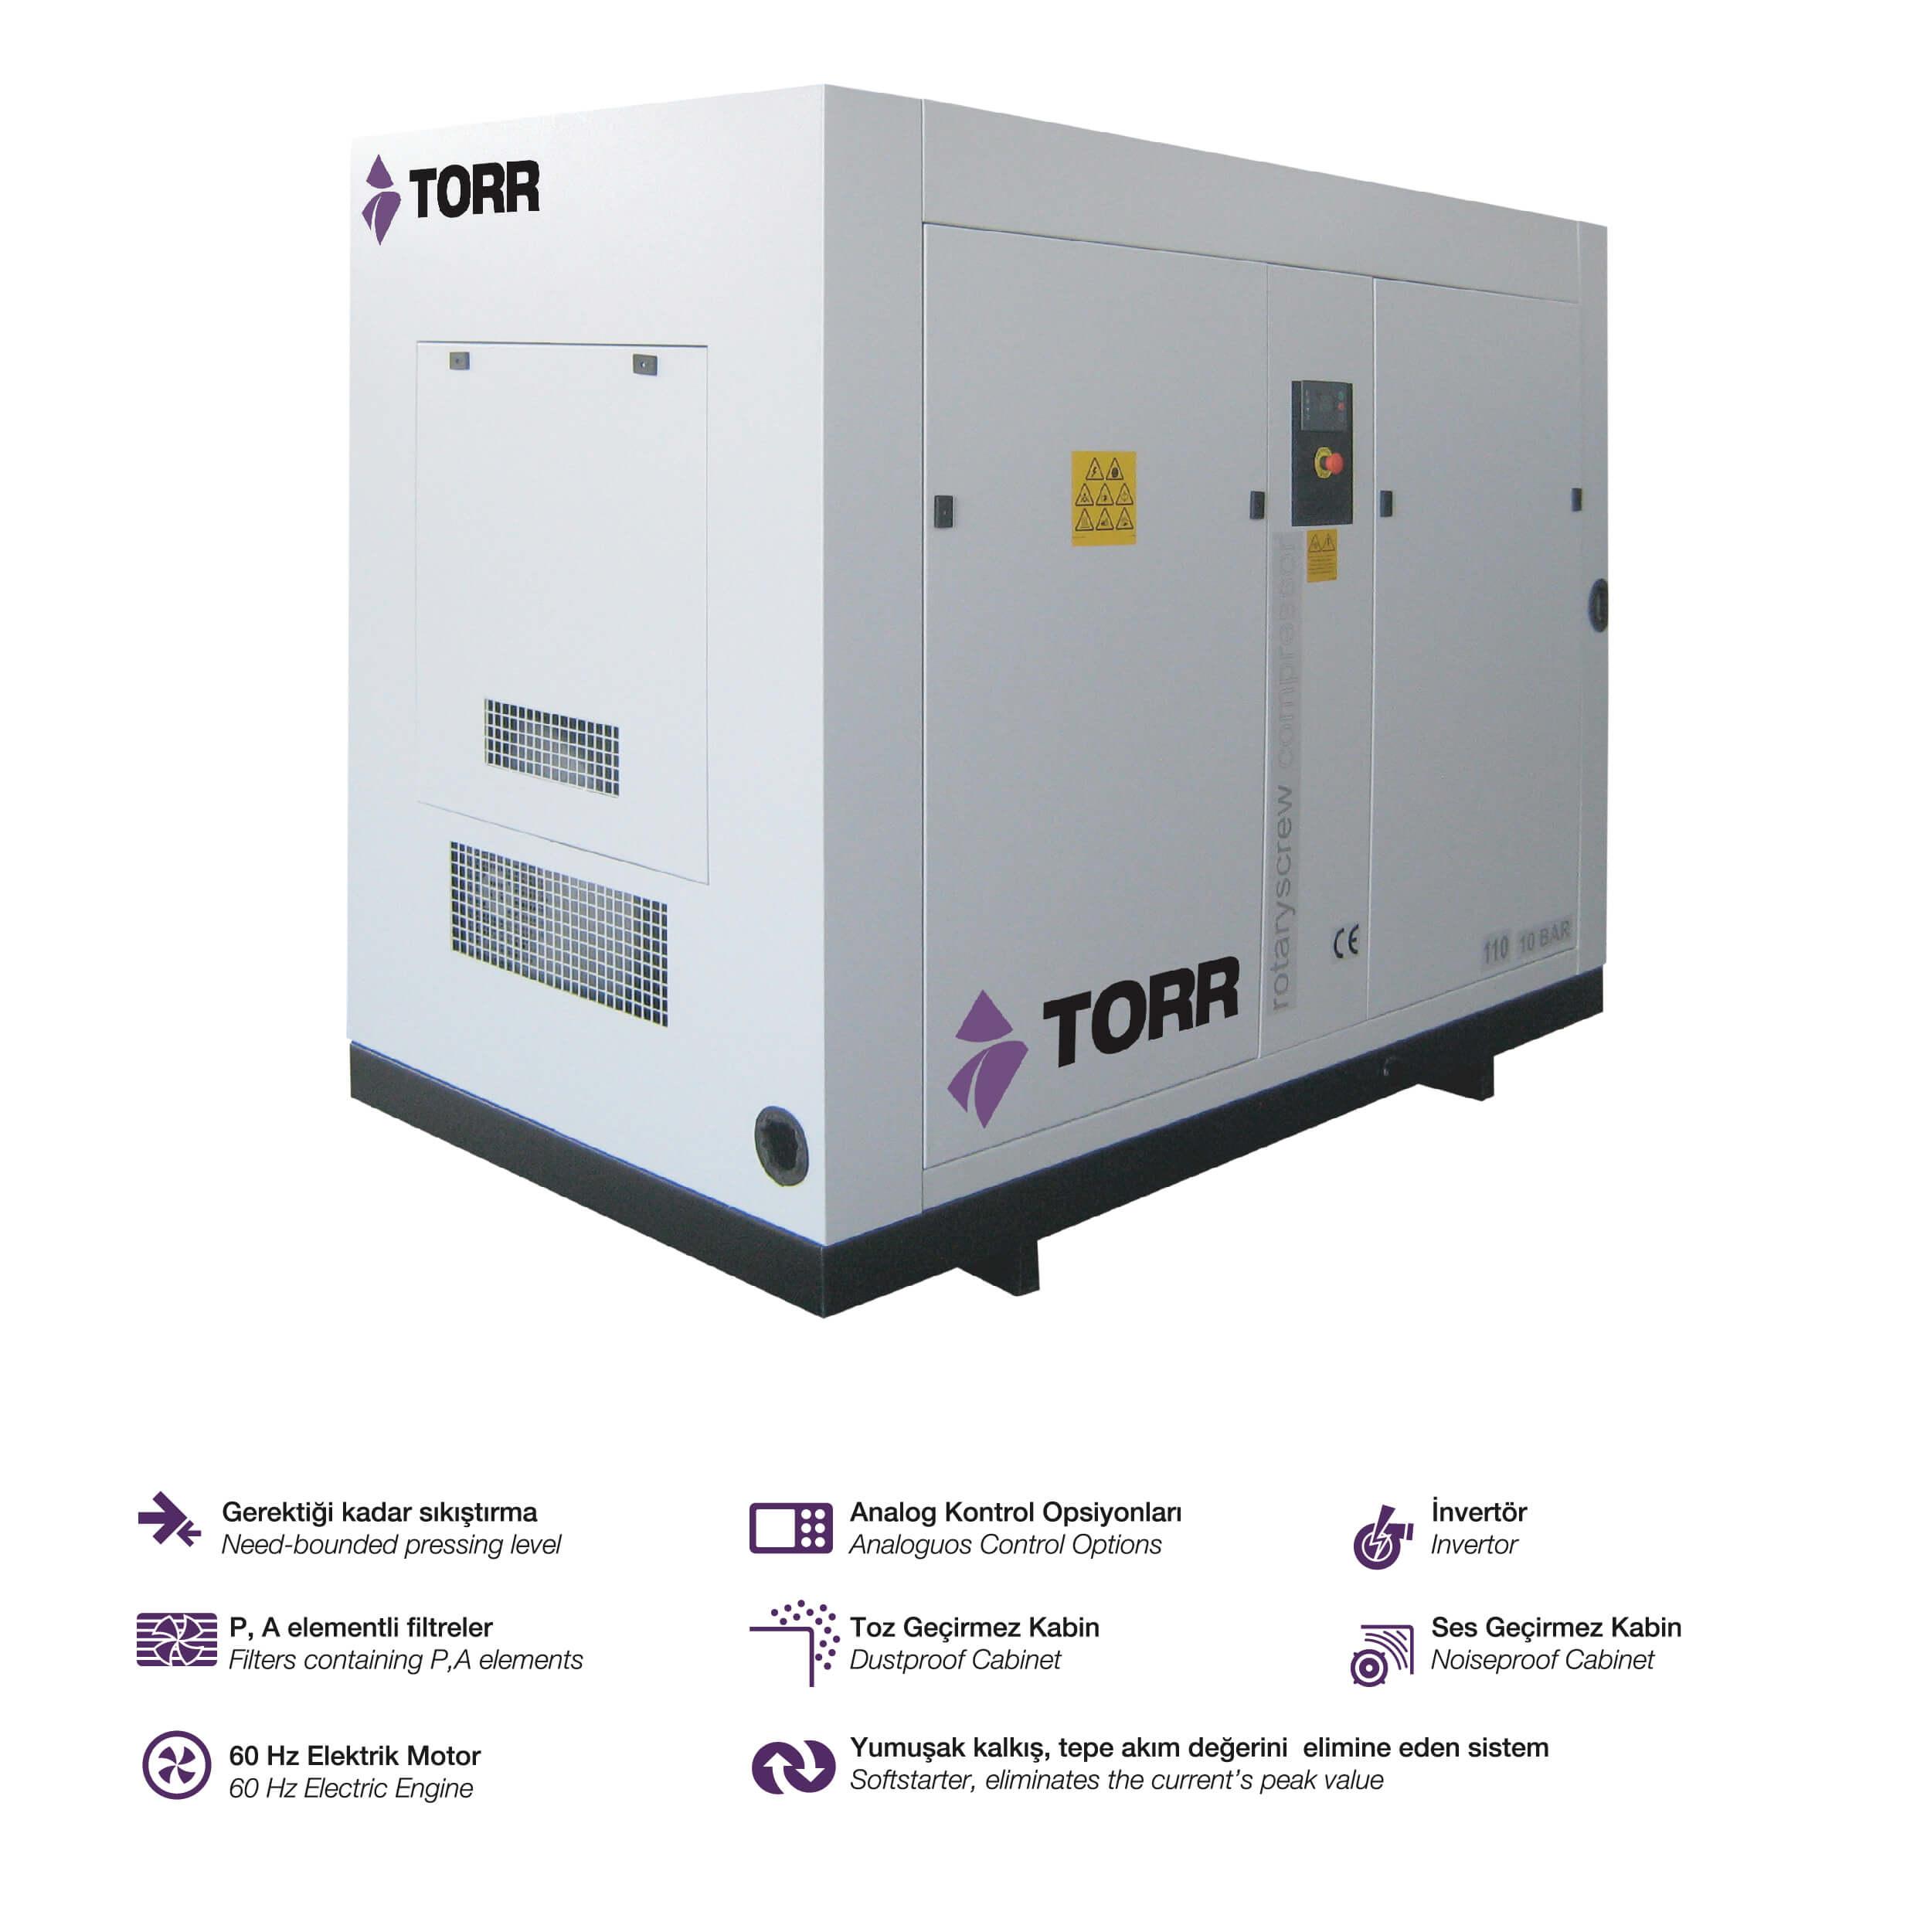 Torr TSC DA Direkt Akuple Hava Kompresörü-01